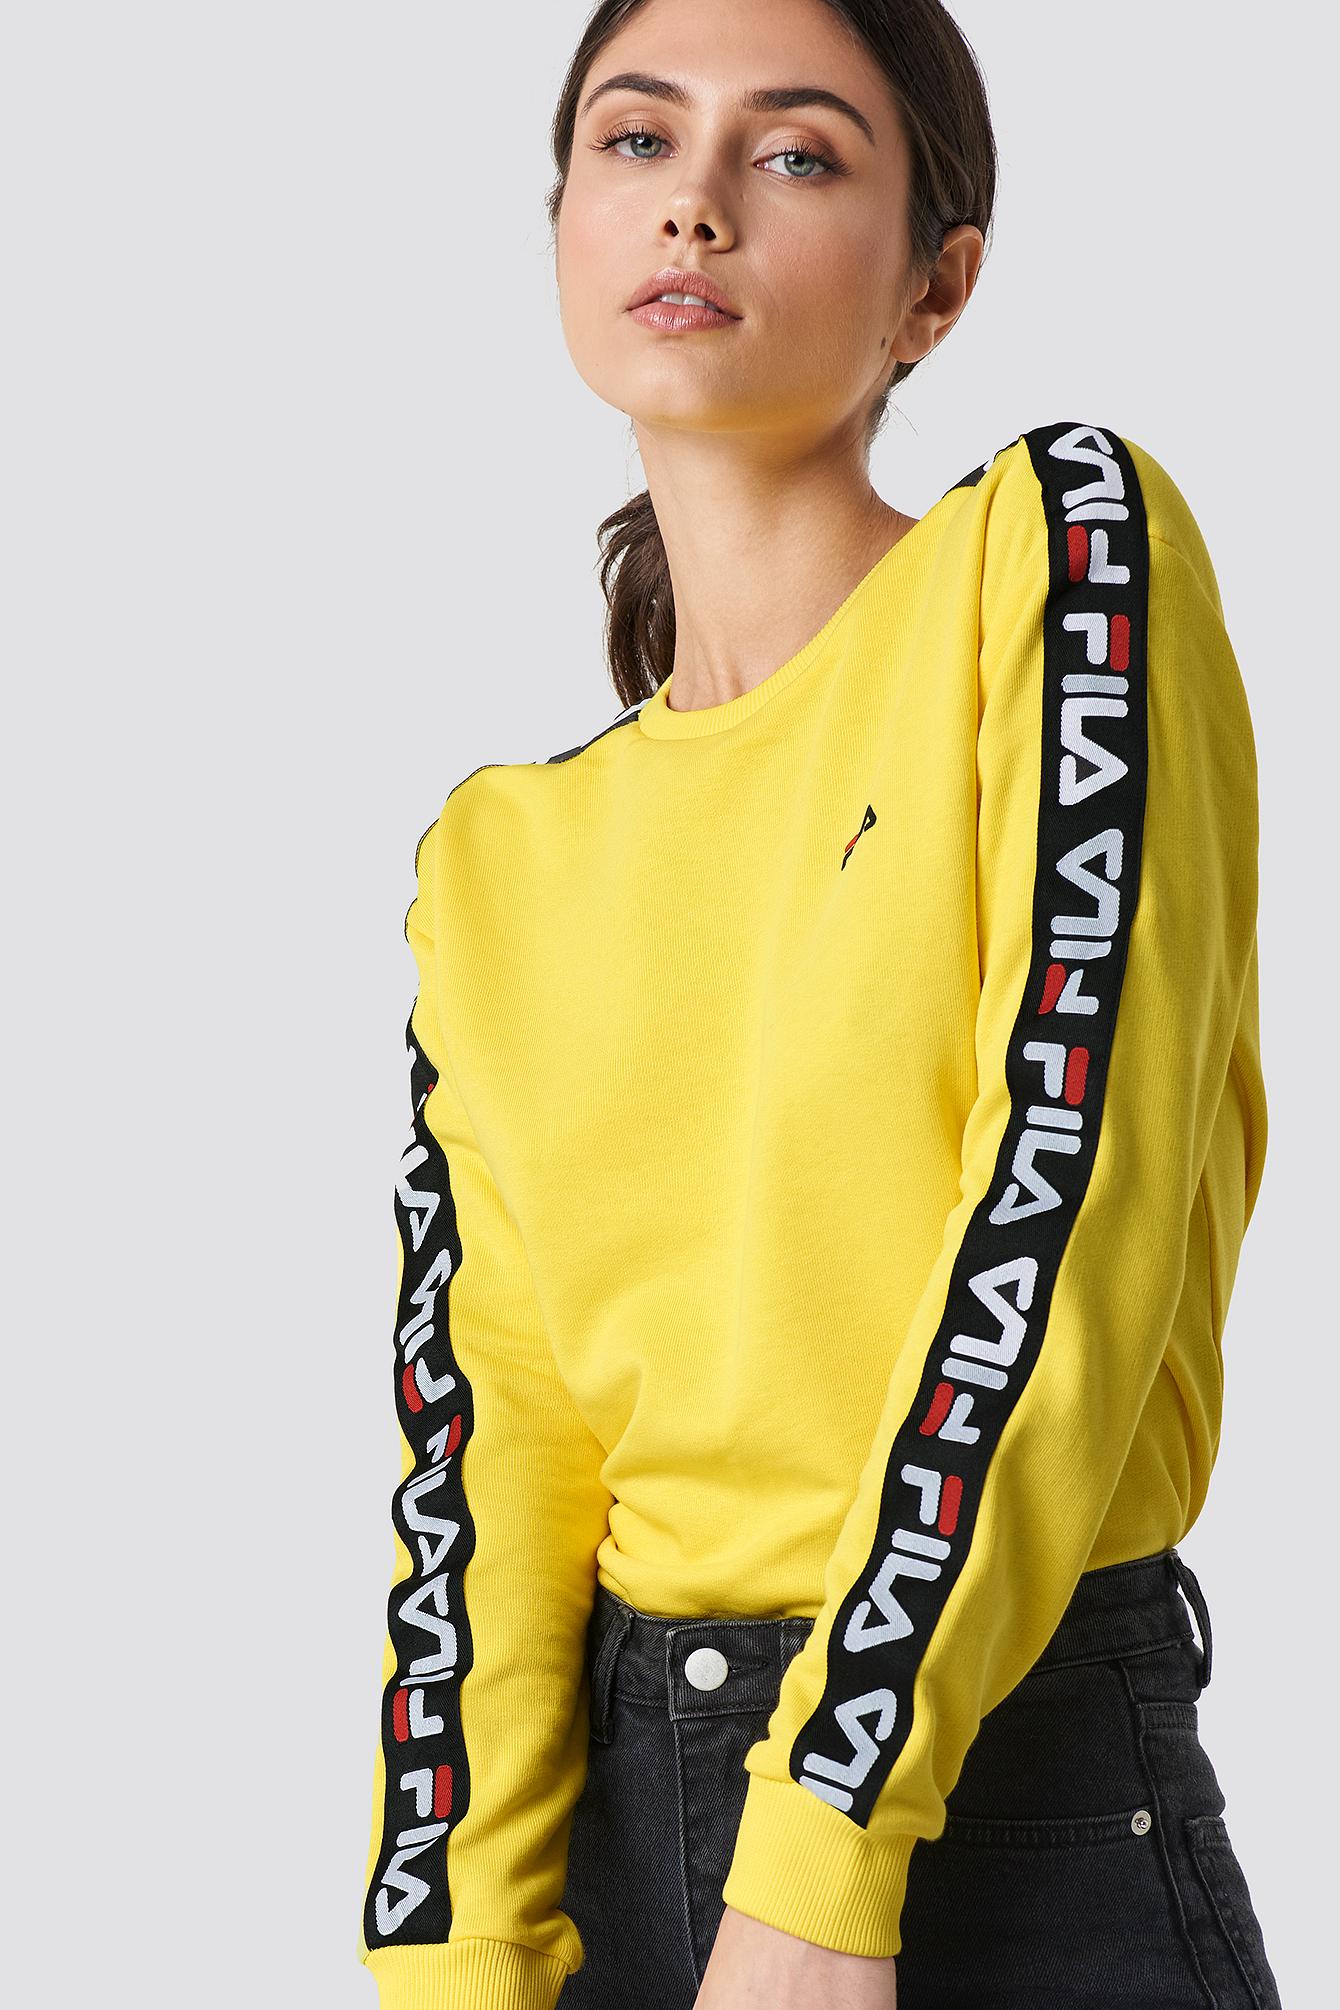 Fila Tivka Crew Sweat - Yellow  9f06684a50